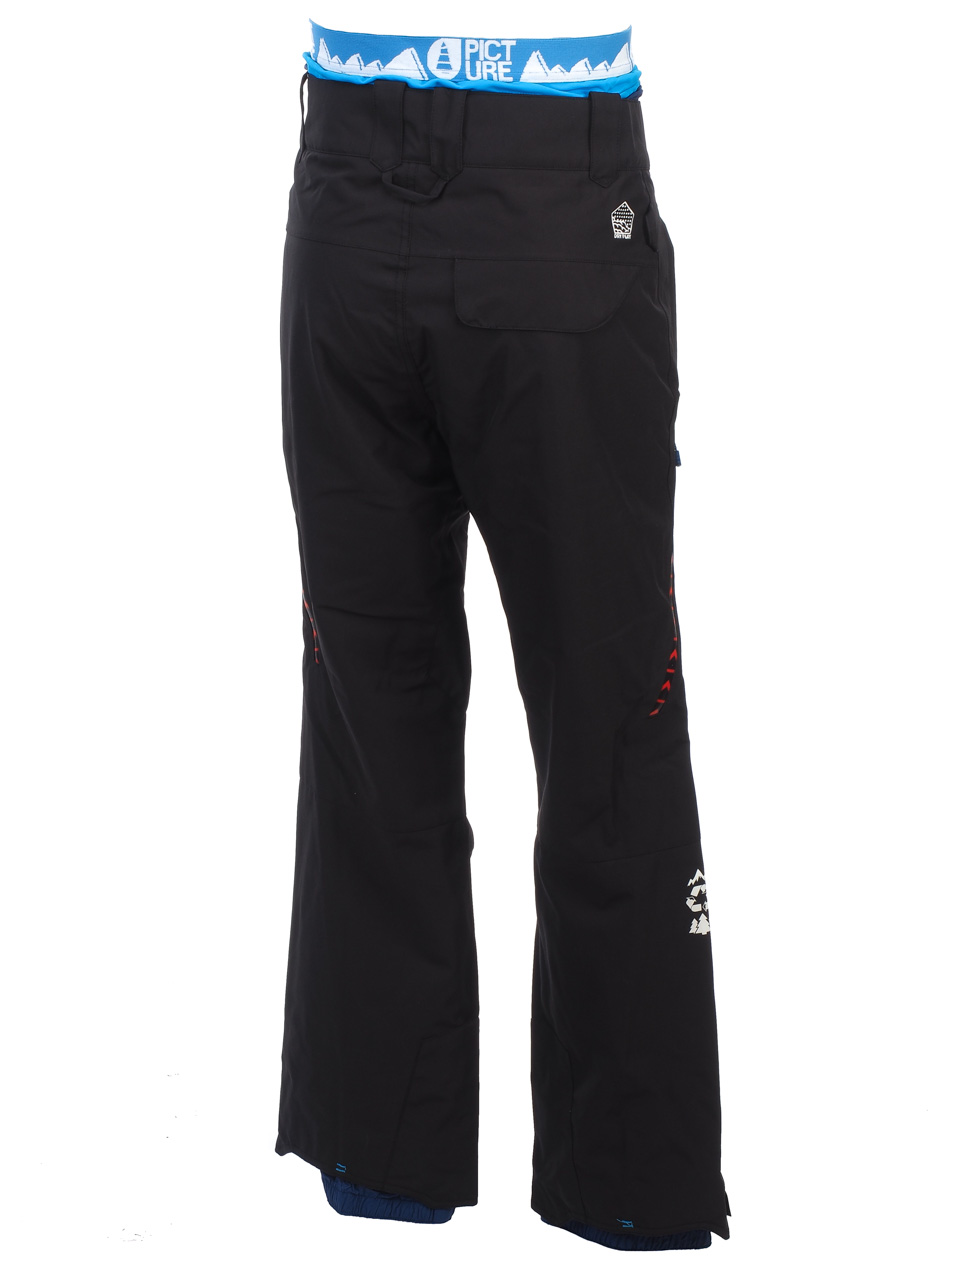 Pantalon-de-ski-surf-Picture-Base-blk-pant-fit-ski-Noir-67948-Neuf miniature 5